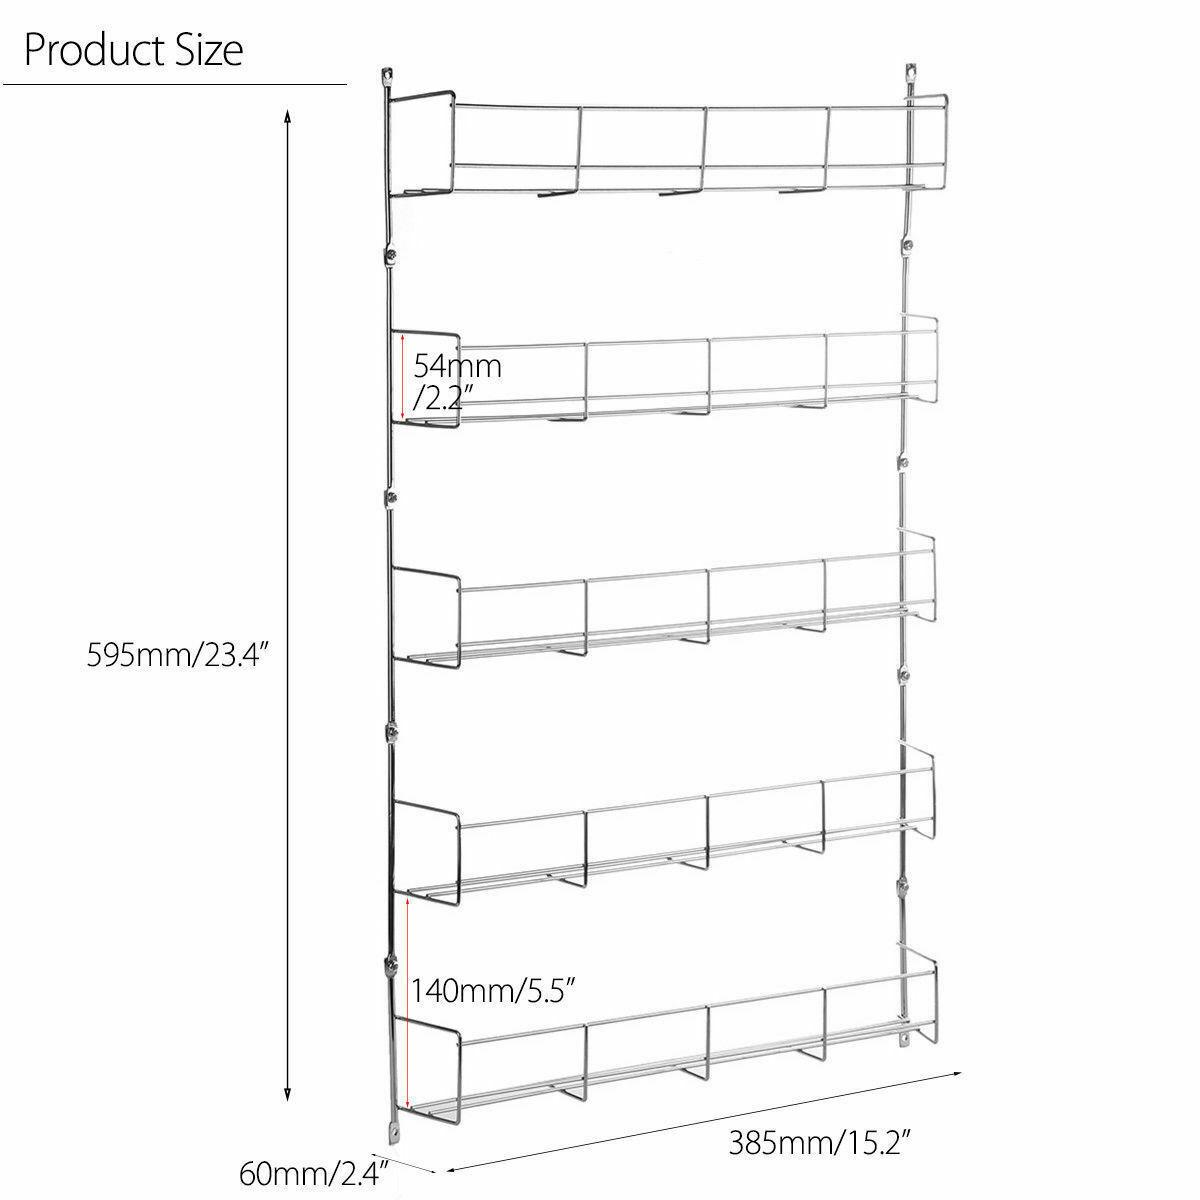 UK Spice Herb Jar Rack Holder For Kitchen Door Cupboard Storage Wall 4 5 6 Tier